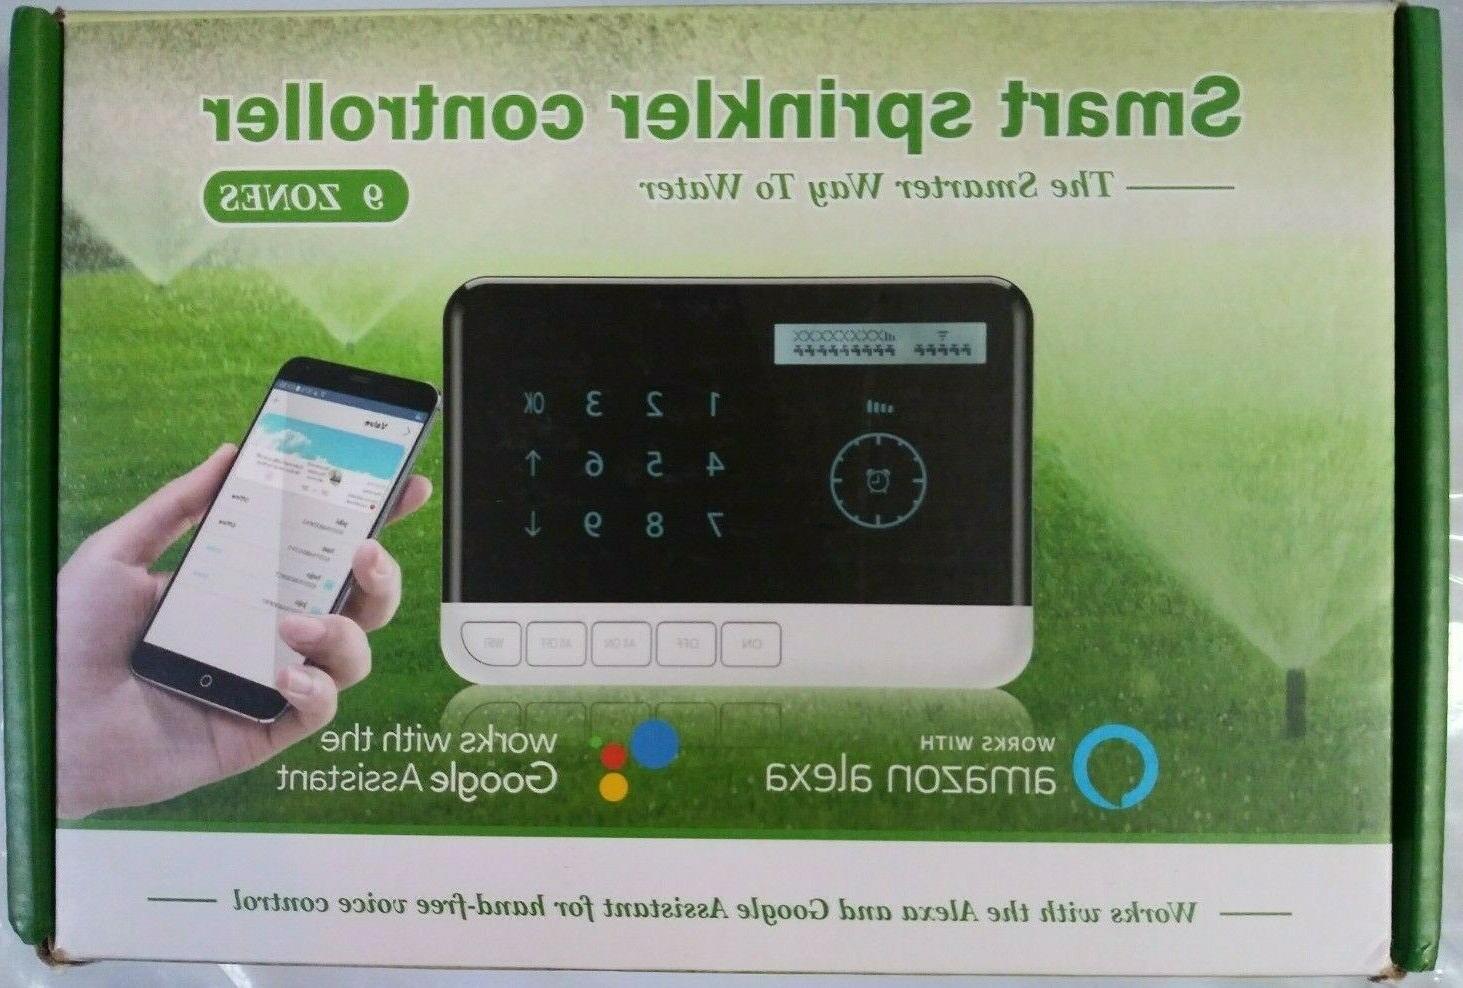 smart sprinkler controller 9 zones with wifi